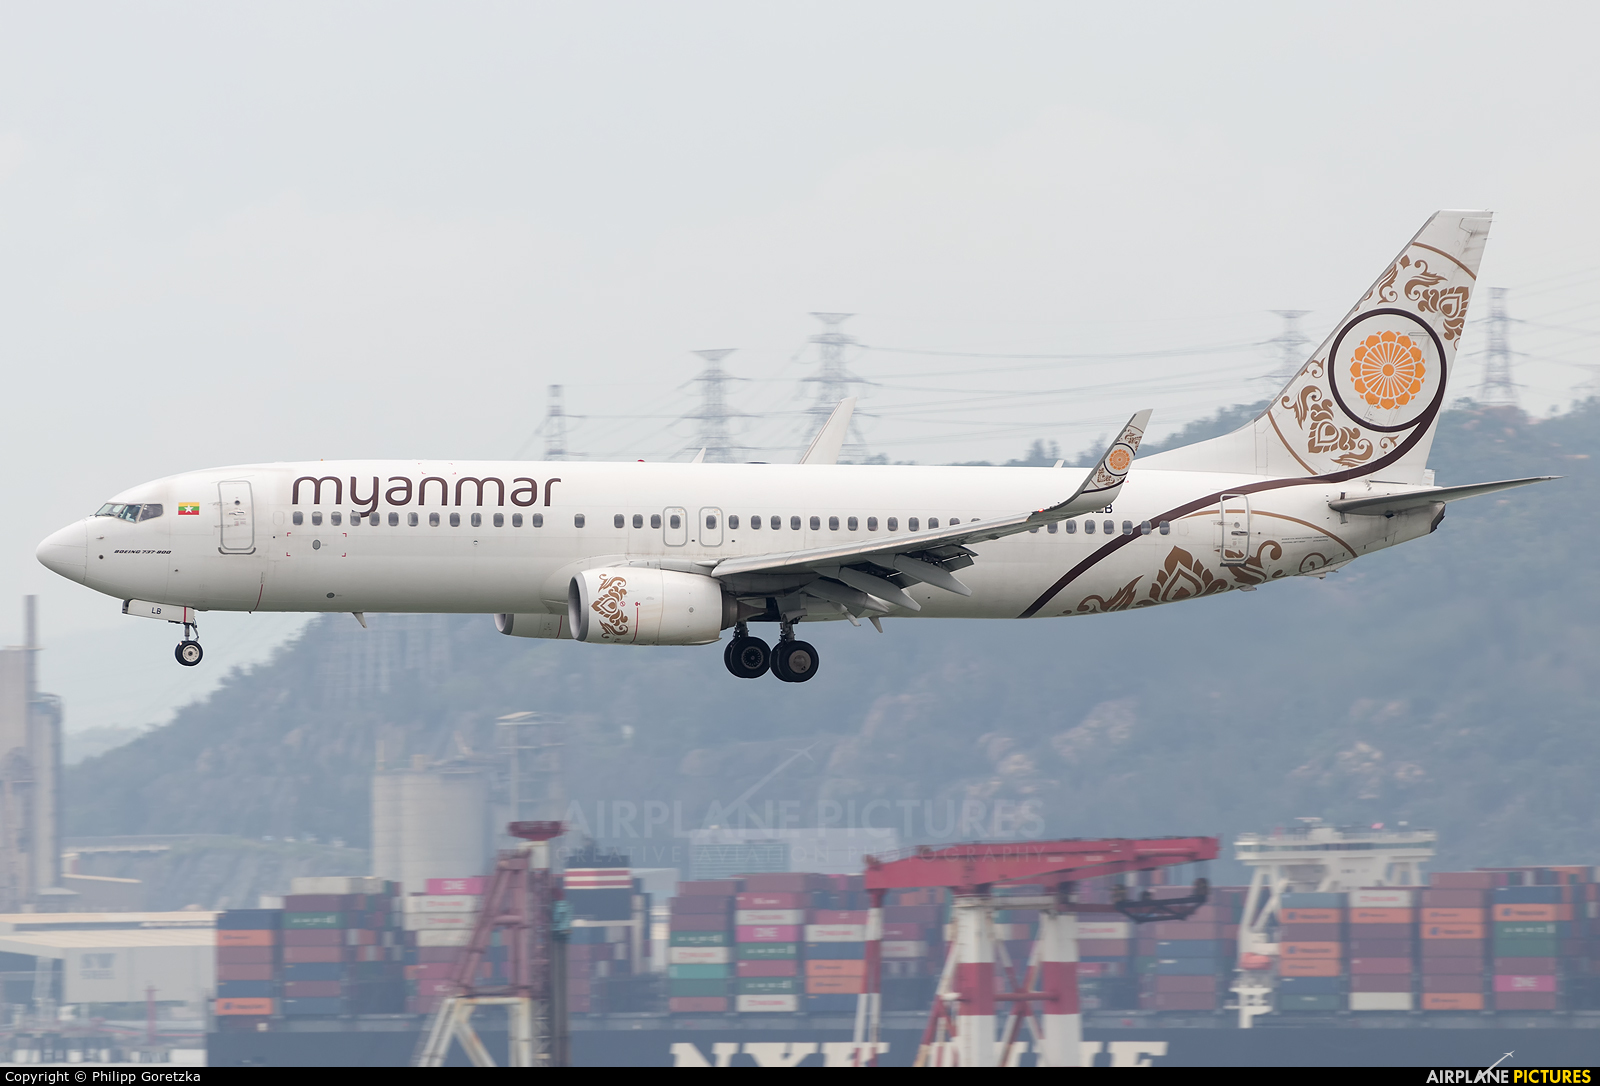 Myanma Airways XY-ALB aircraft at HKG - Chek Lap Kok Intl